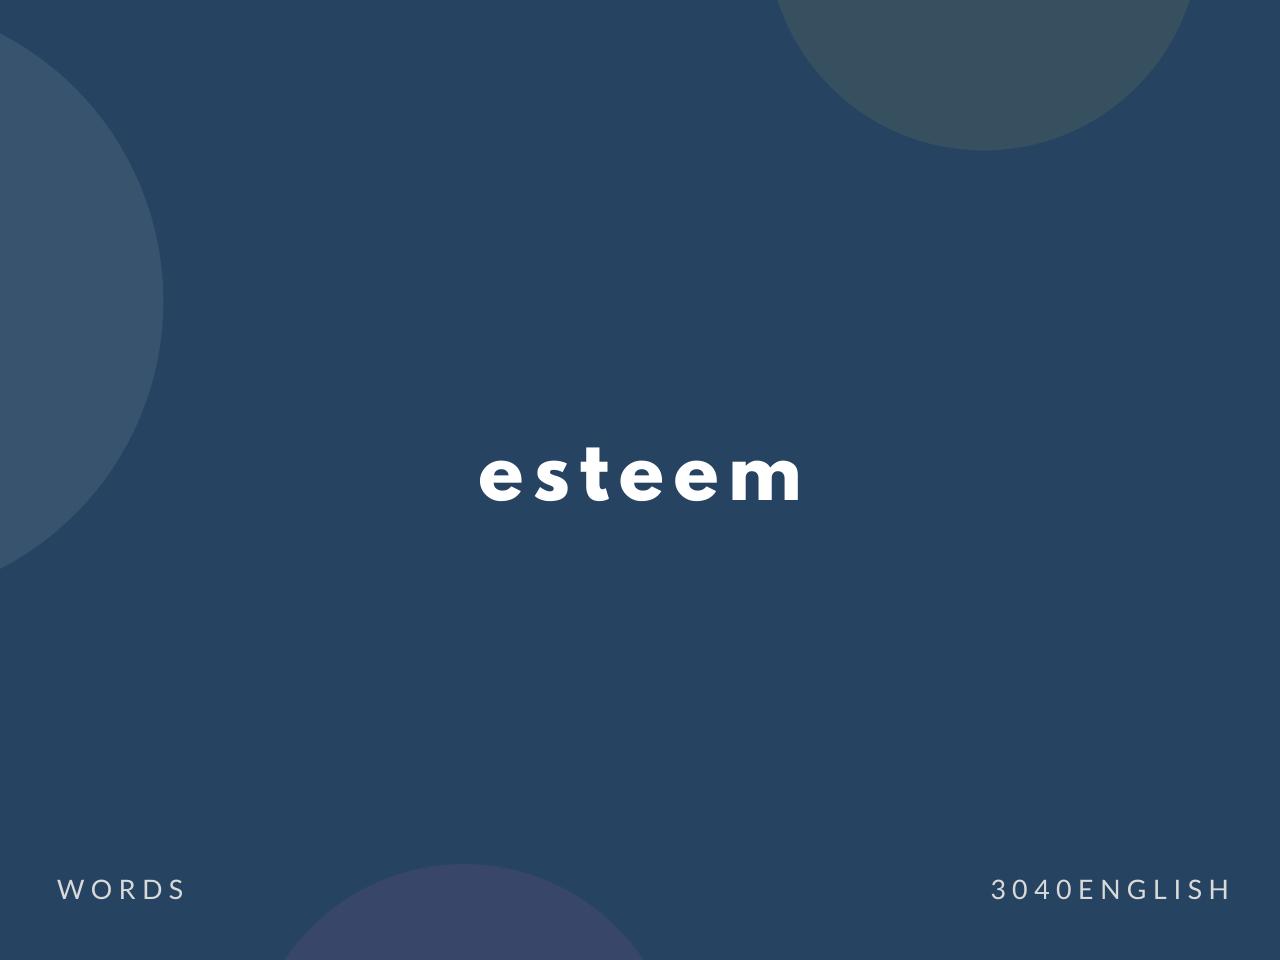 esteem の意味と簡単な使い方【音読用例文あり】